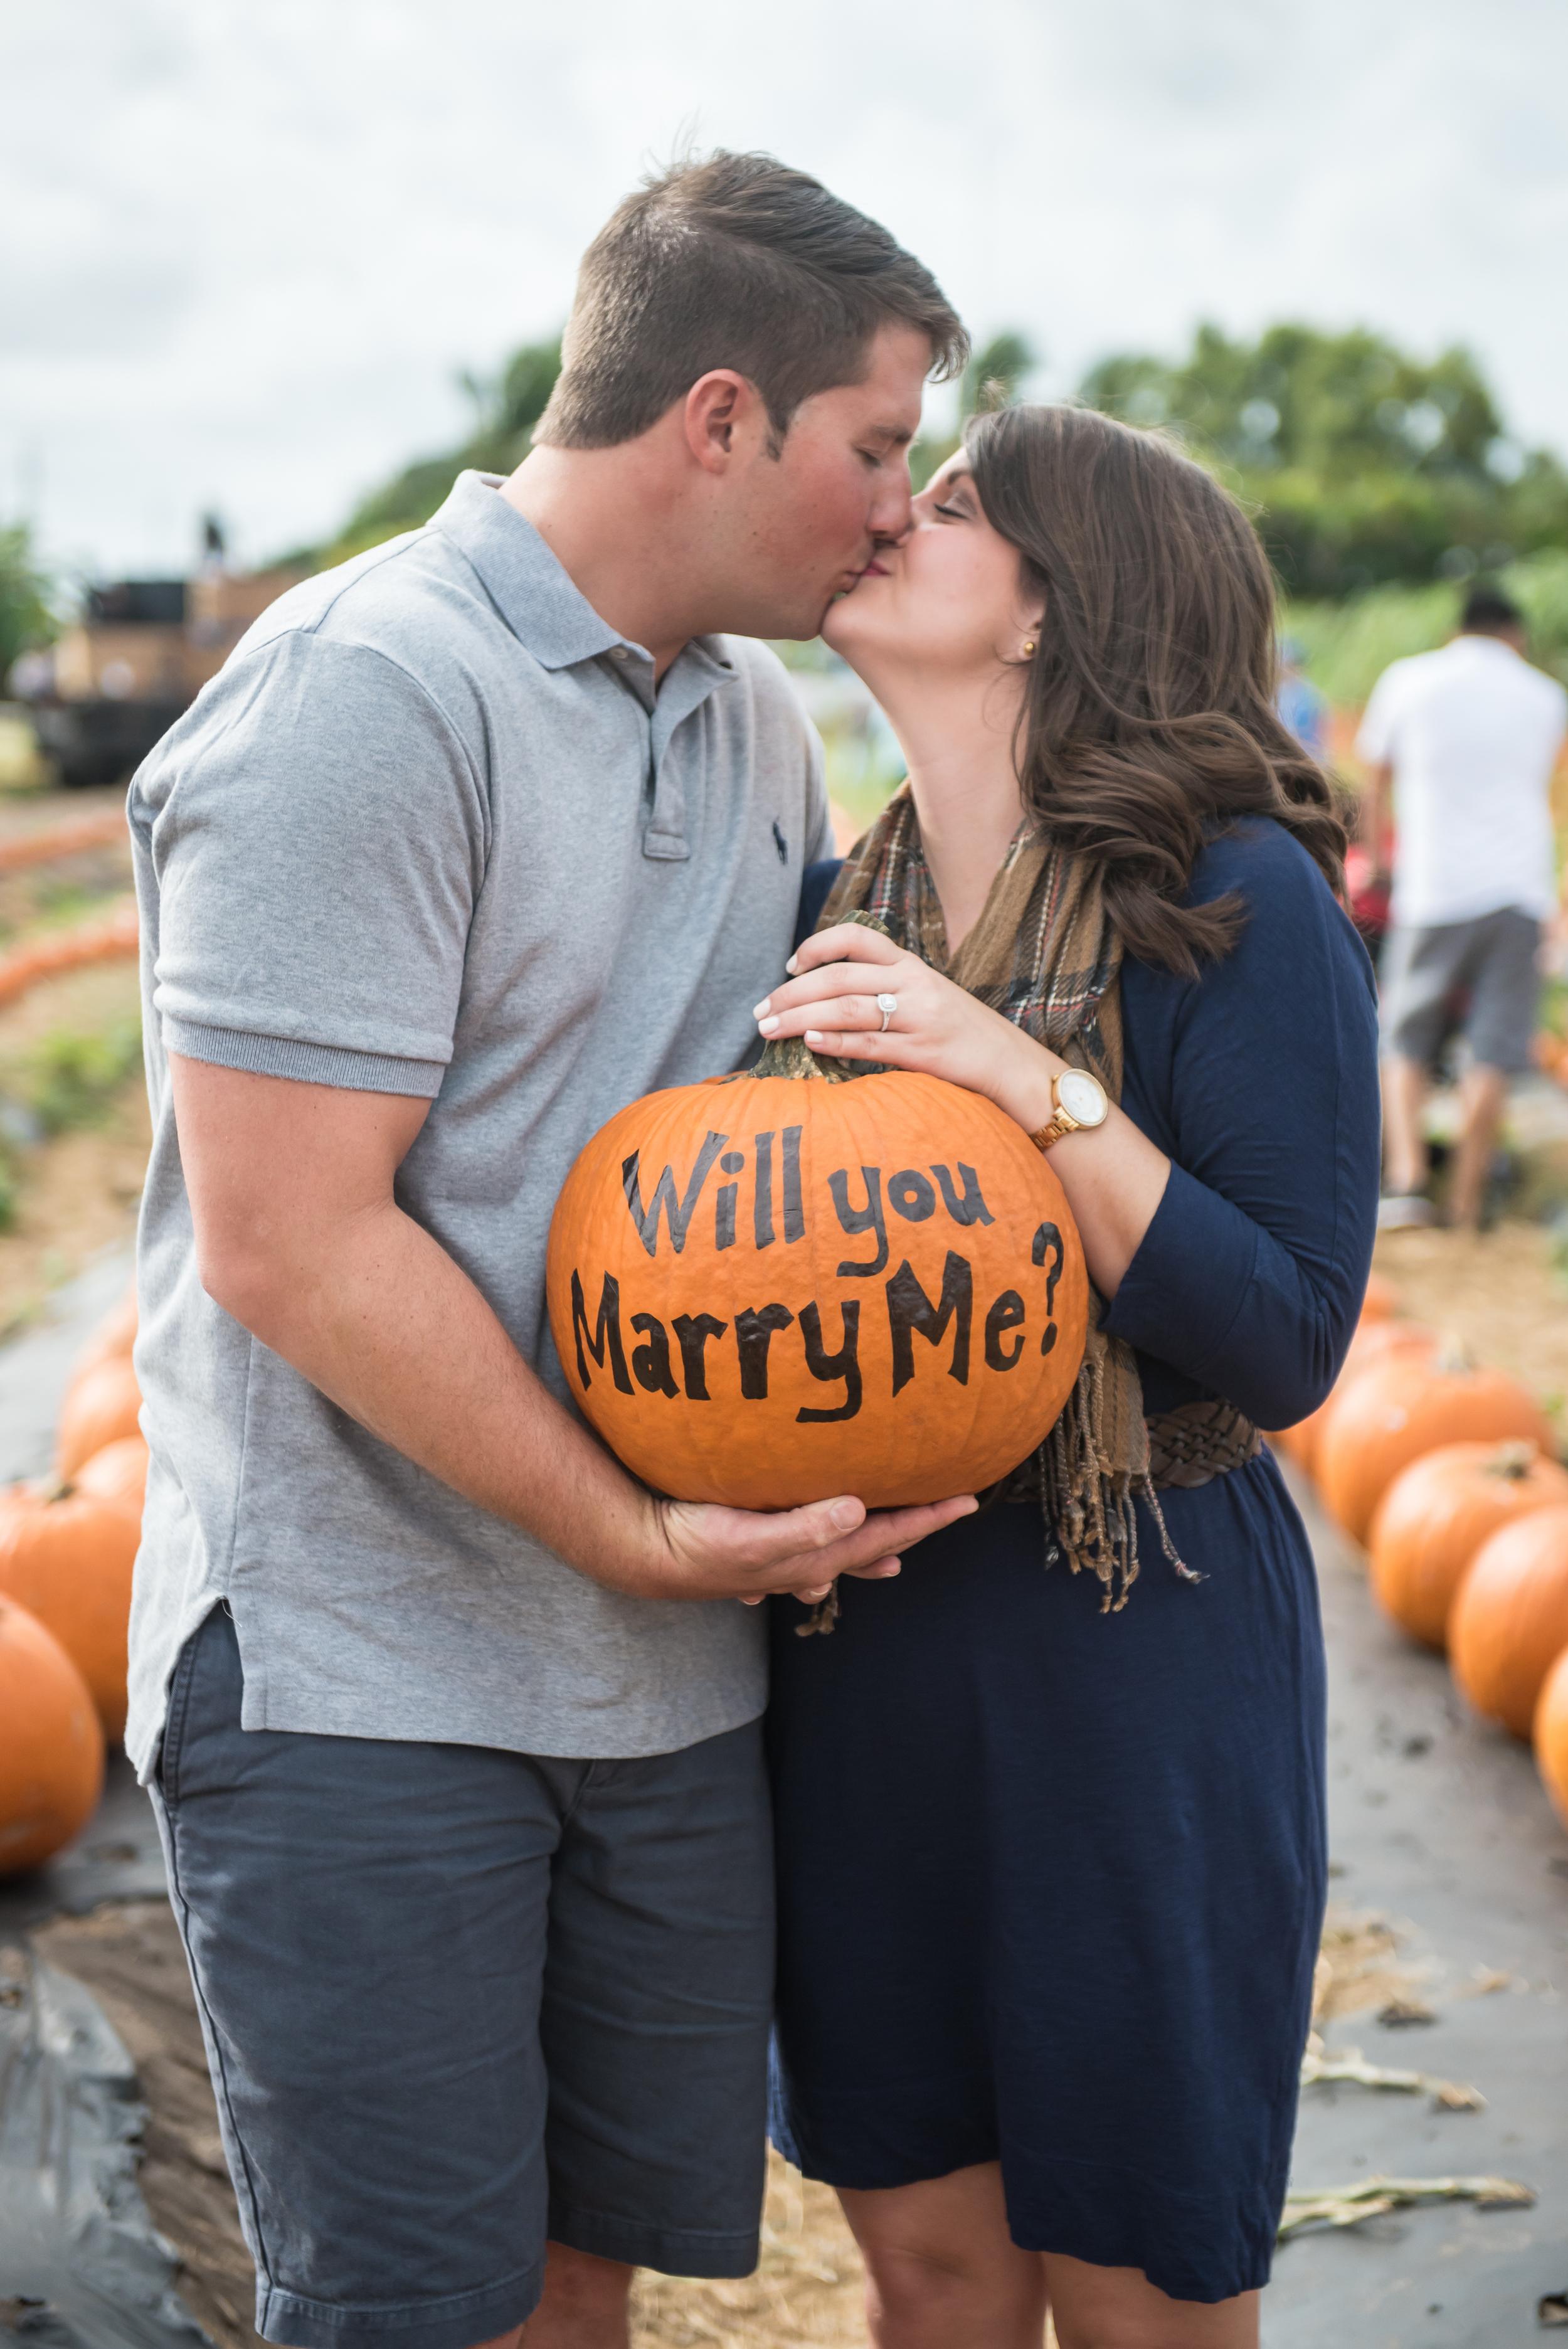 Surprise Proposal | Bedner's Farm Fresh Market